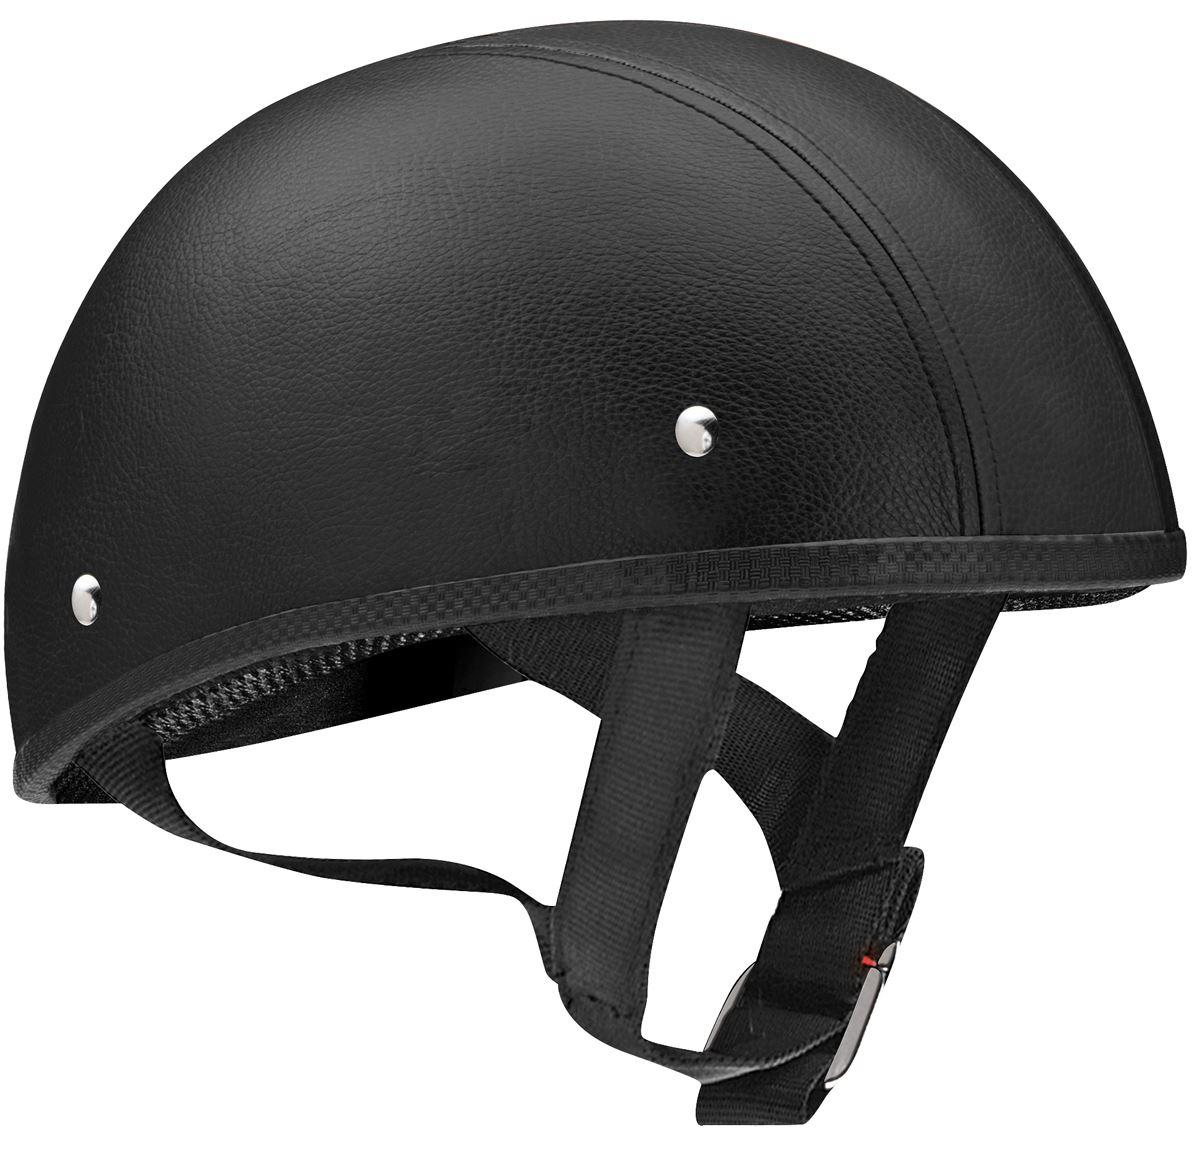 Vega XTS Helmet Naked Half Shorty No Visor 3XS 2XS XS S M